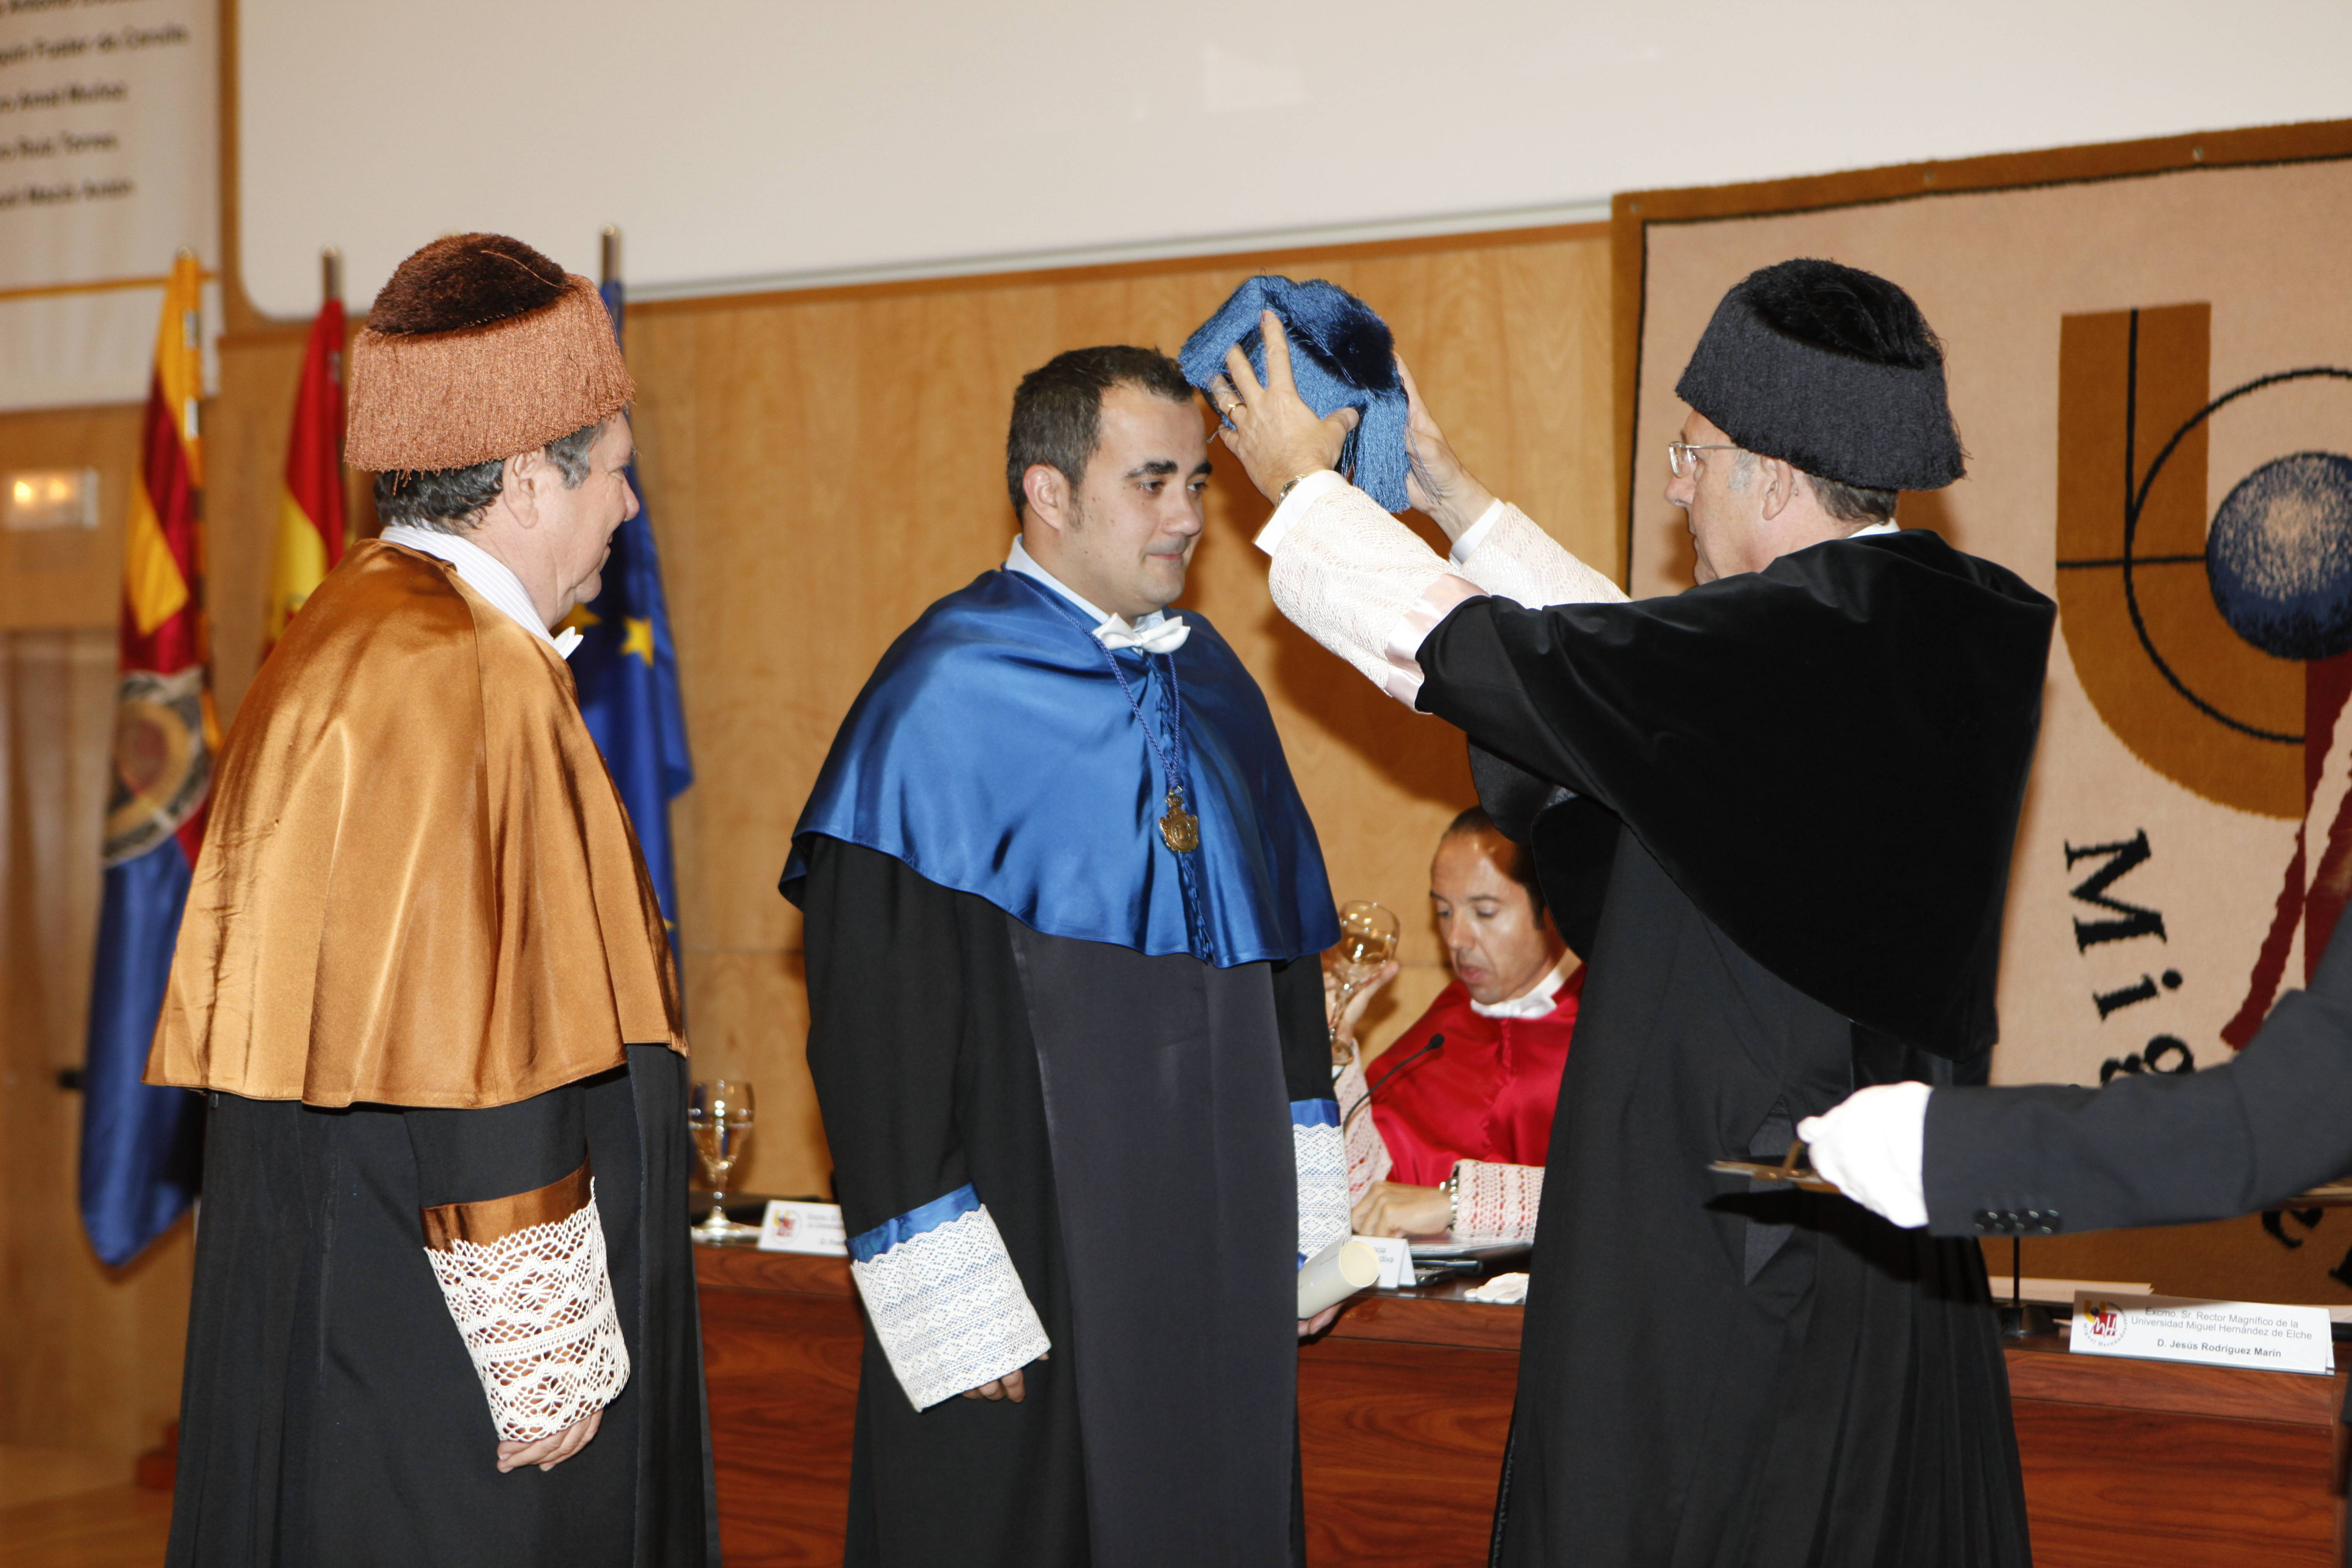 doctor-honoris-causa-luis-gamir_mg_1117.jpg